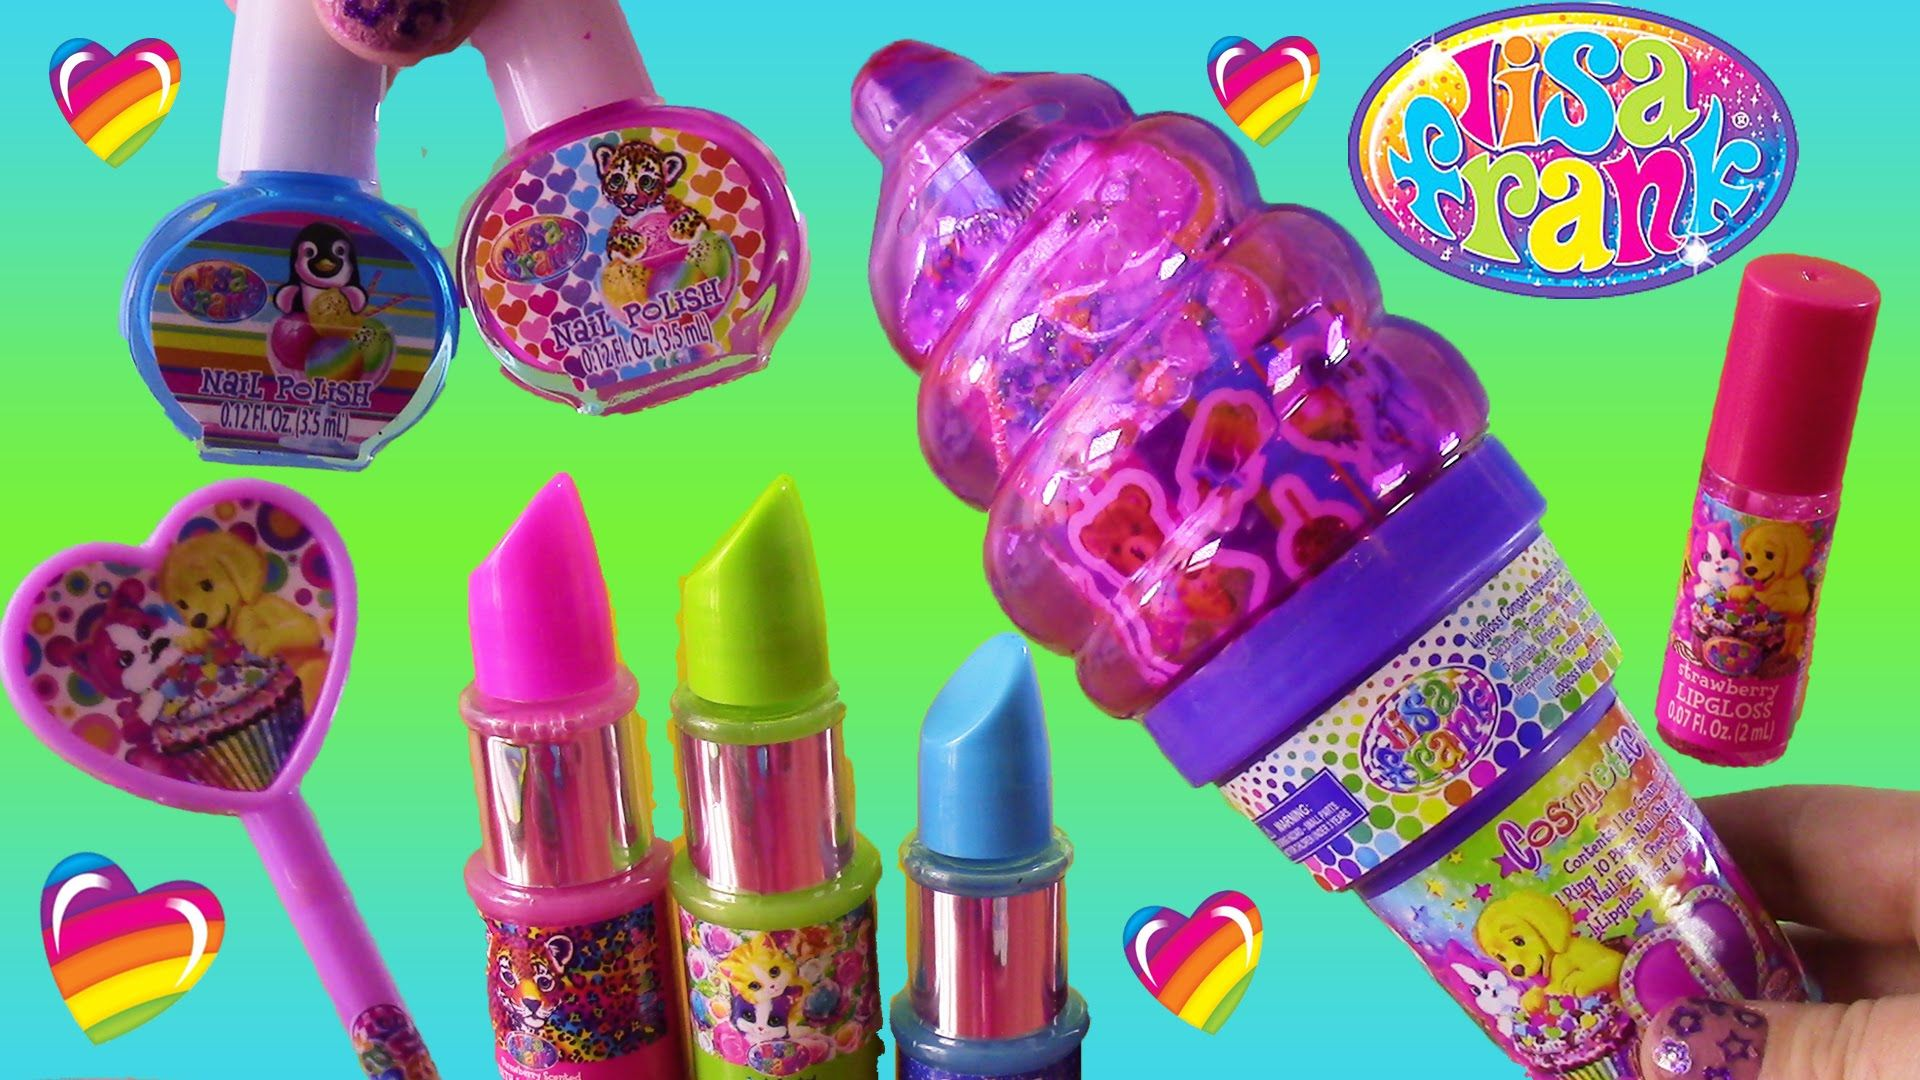 Lisa Frank Beauty Haul! Projector Lip Balm Lipstick  Surprise Ice Cream Cone